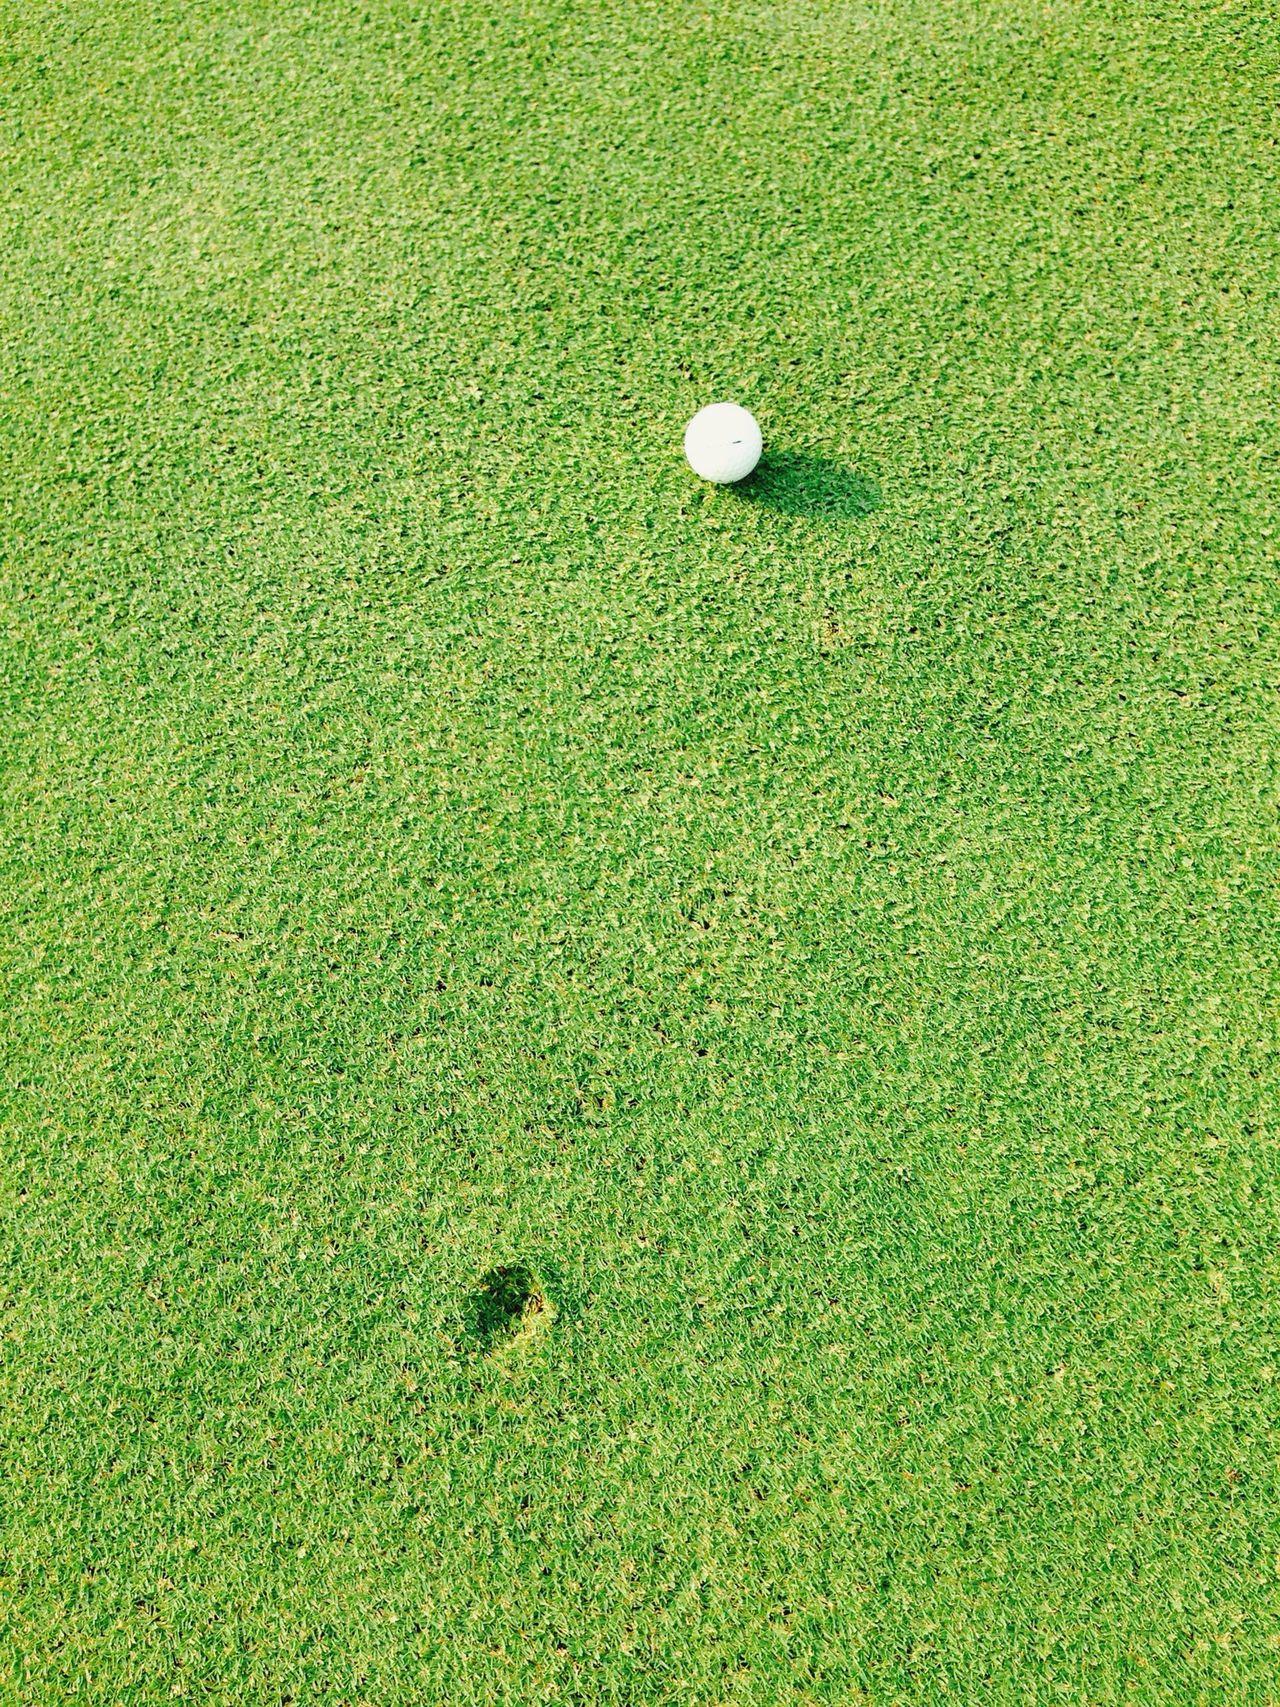 Beautiful stock photos of golf, Day, Golf Ball, Golf Course, Grass